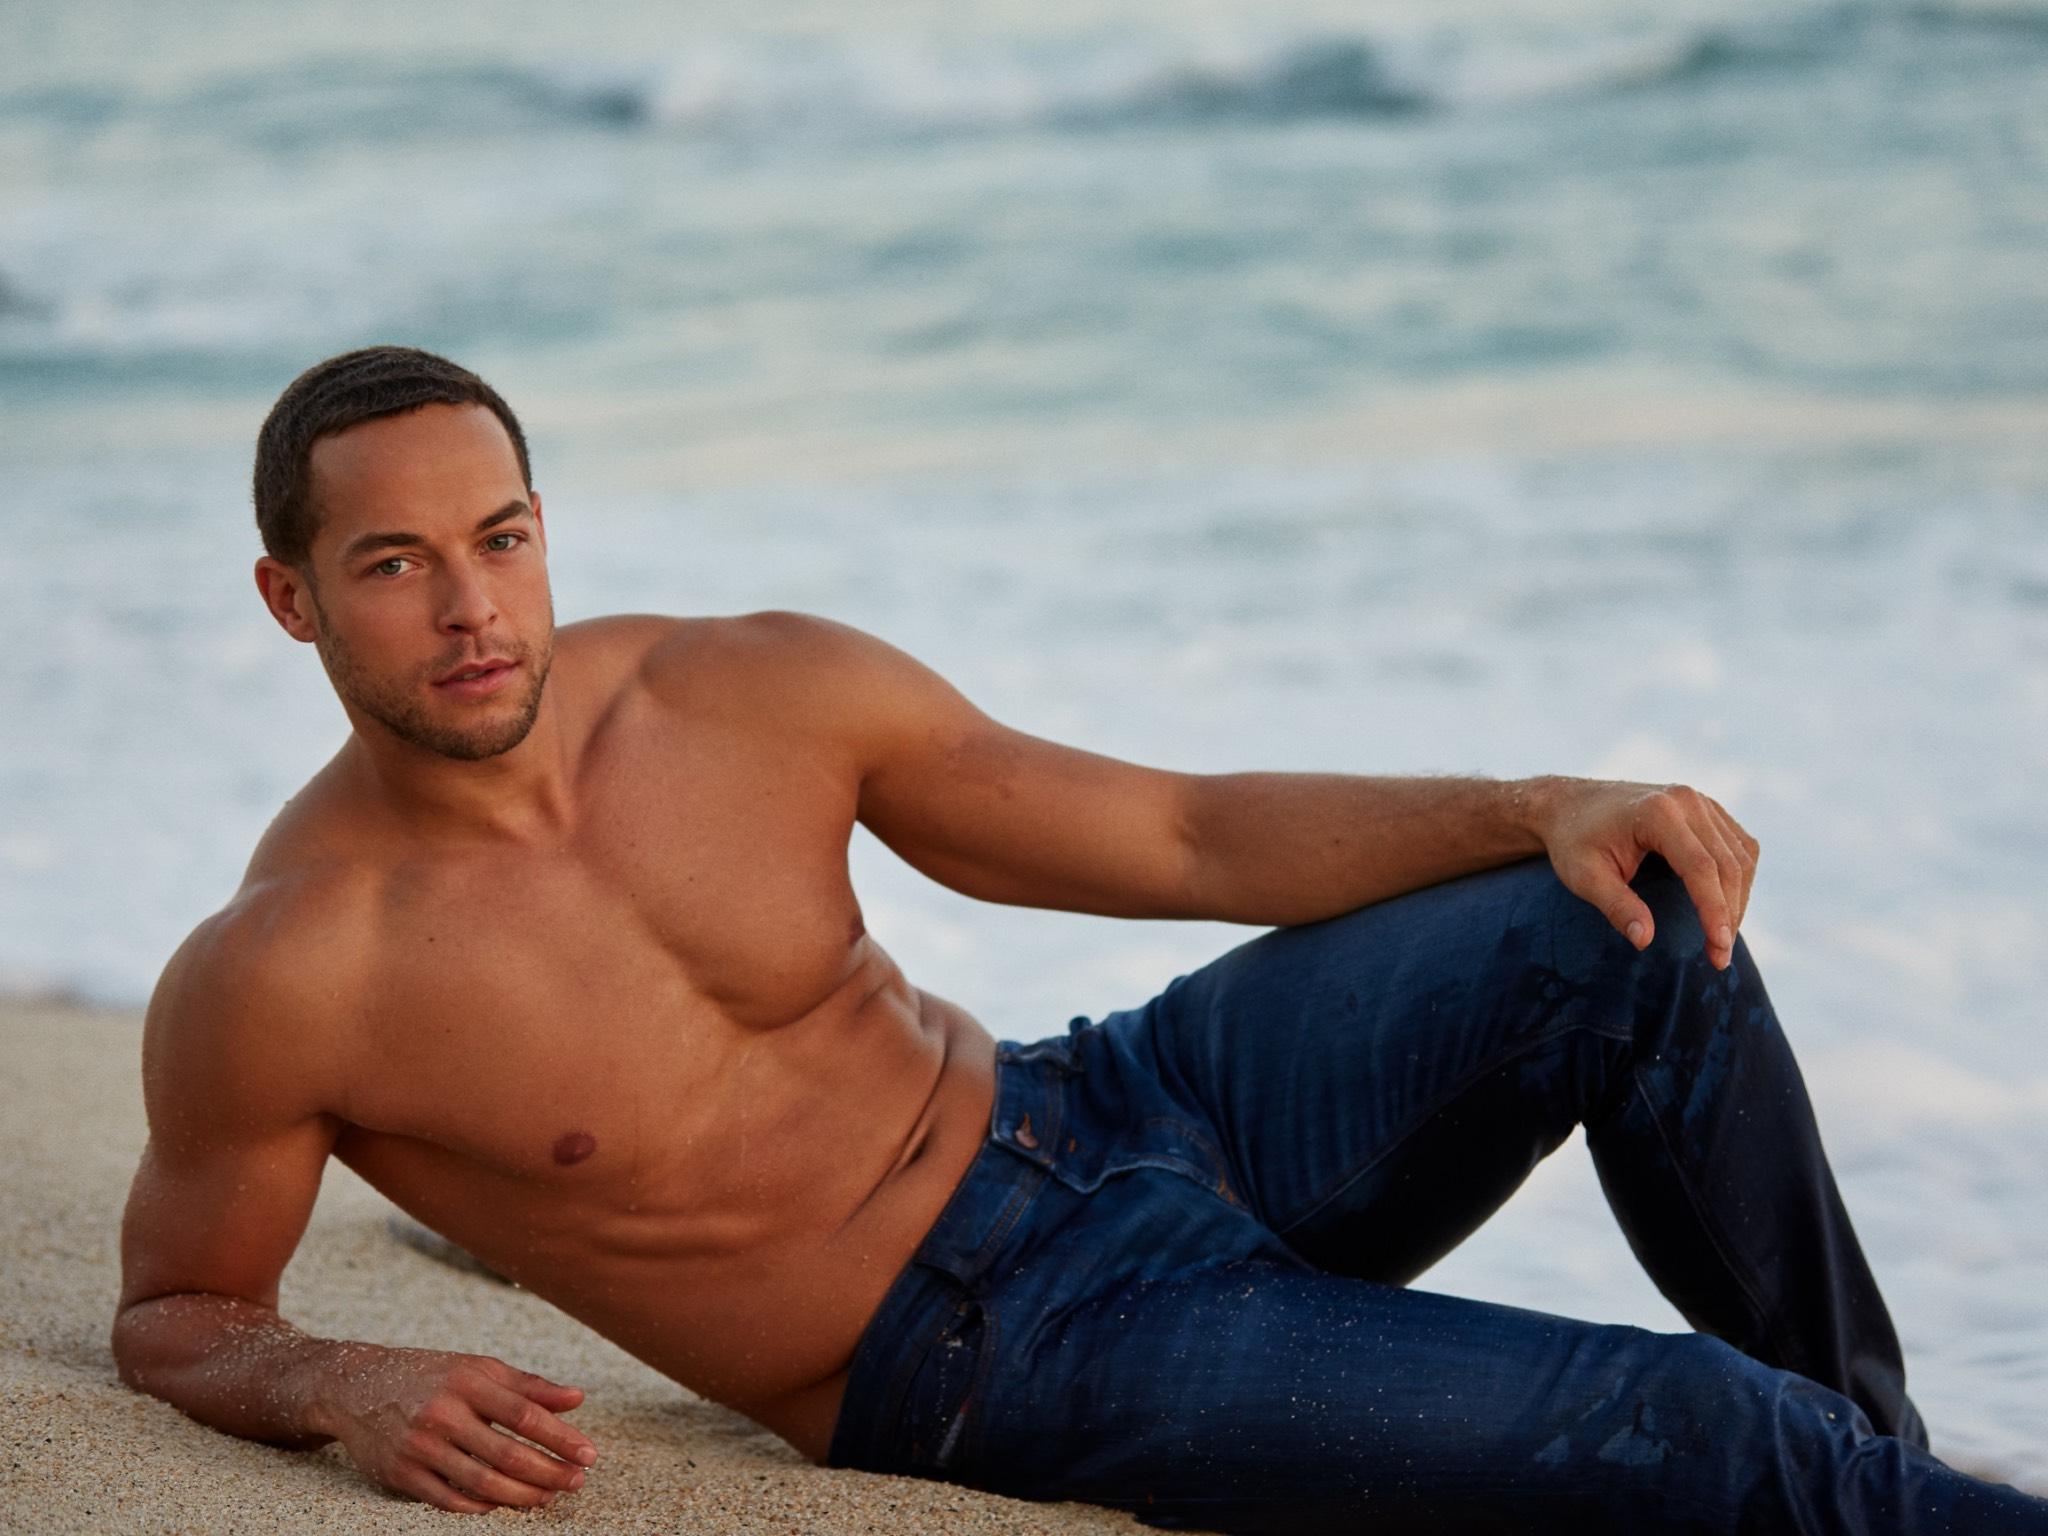 Andrej ist der neue Bachelor. Foto: MG RTL D/Arya Shirazi